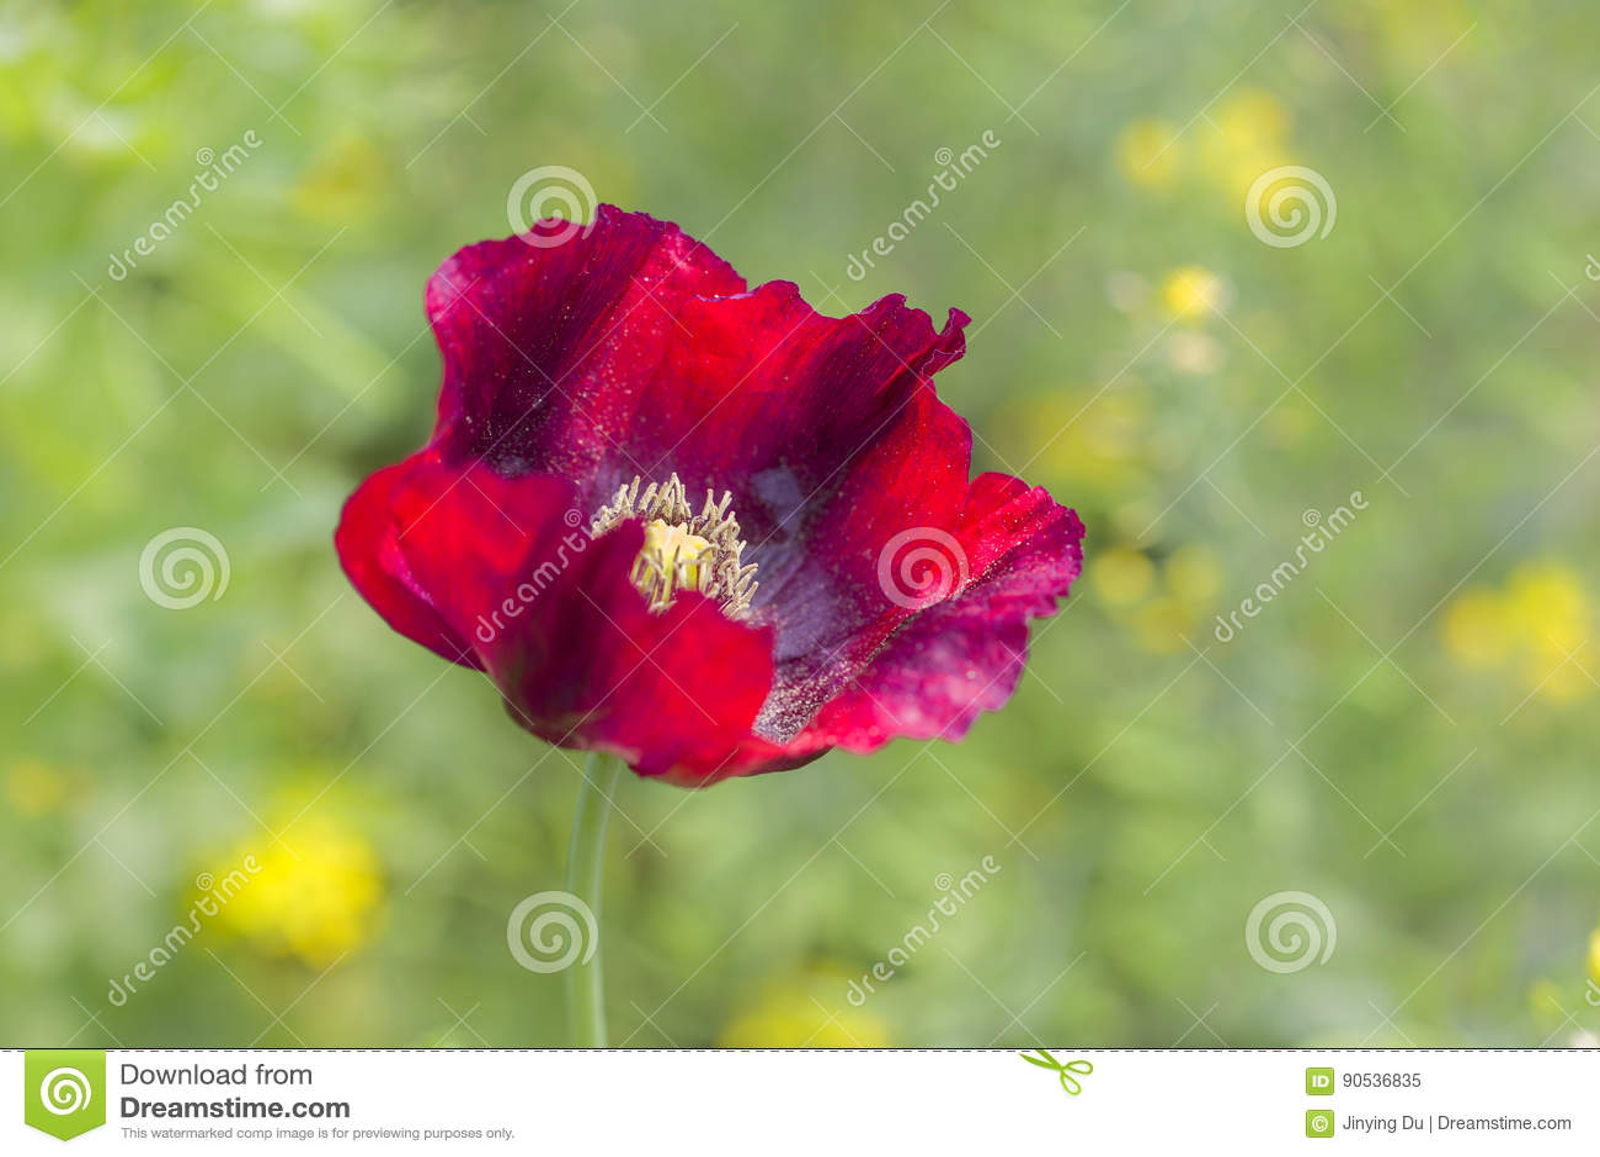 Beautiful Poppy Flower Stock Image Image Of Design Decorative